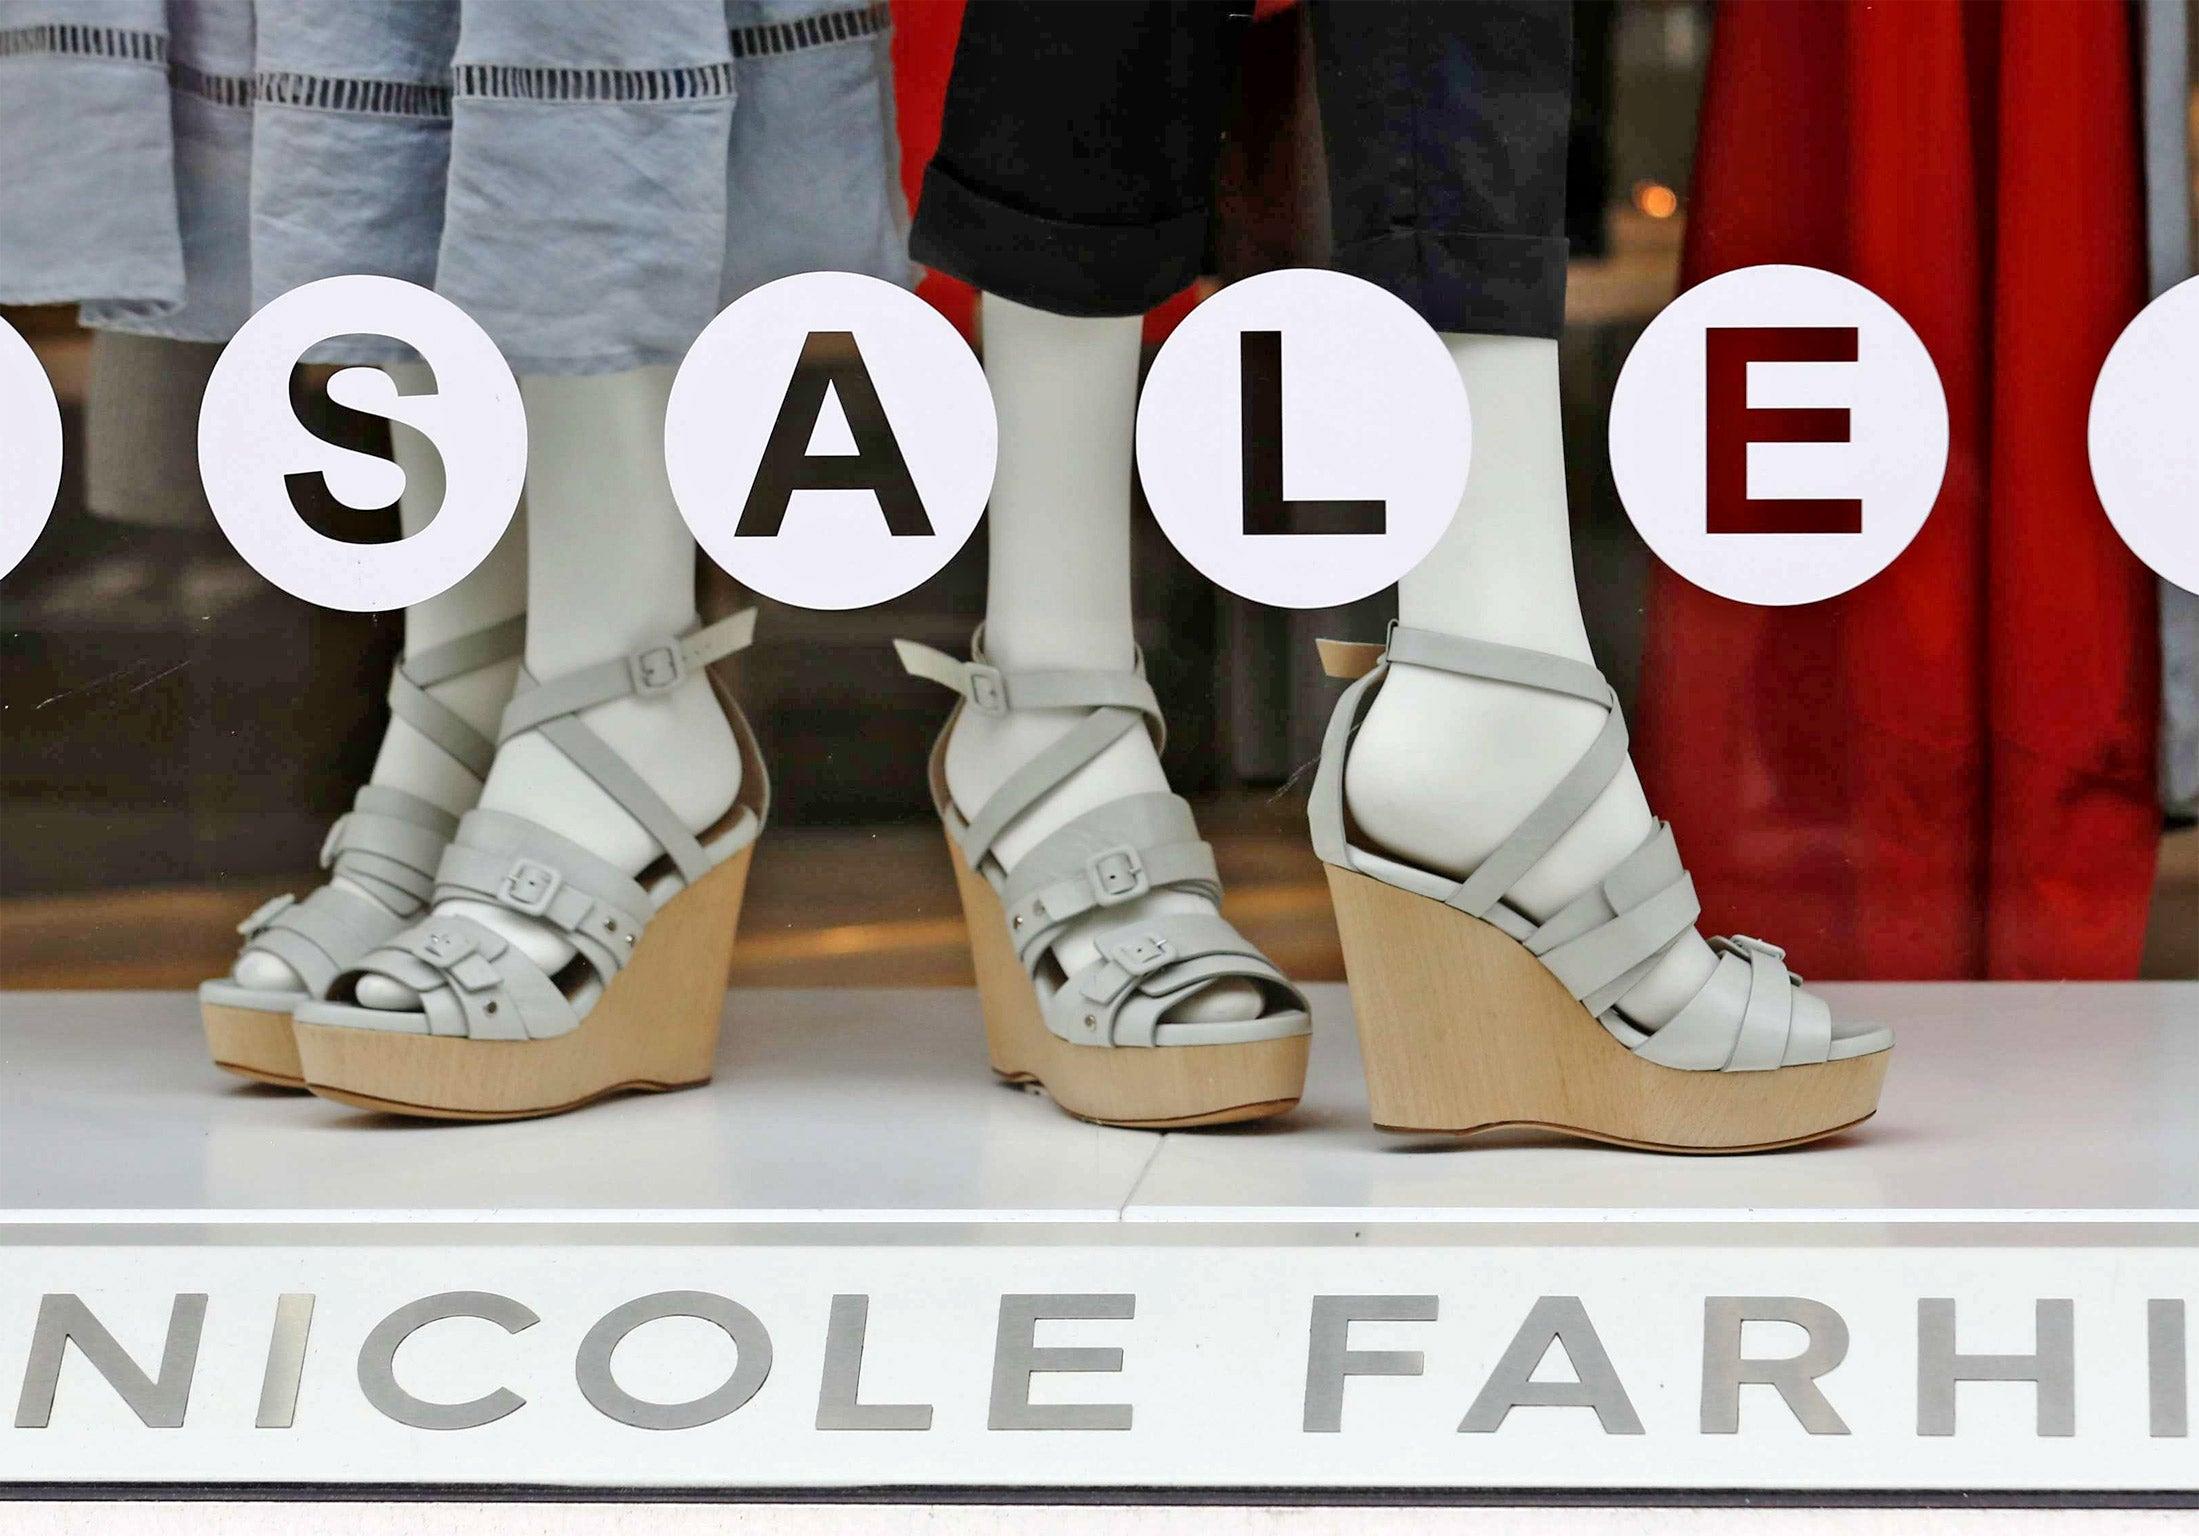 531411d0ba British fashion brand Nicole Farhi enters administration - but is.